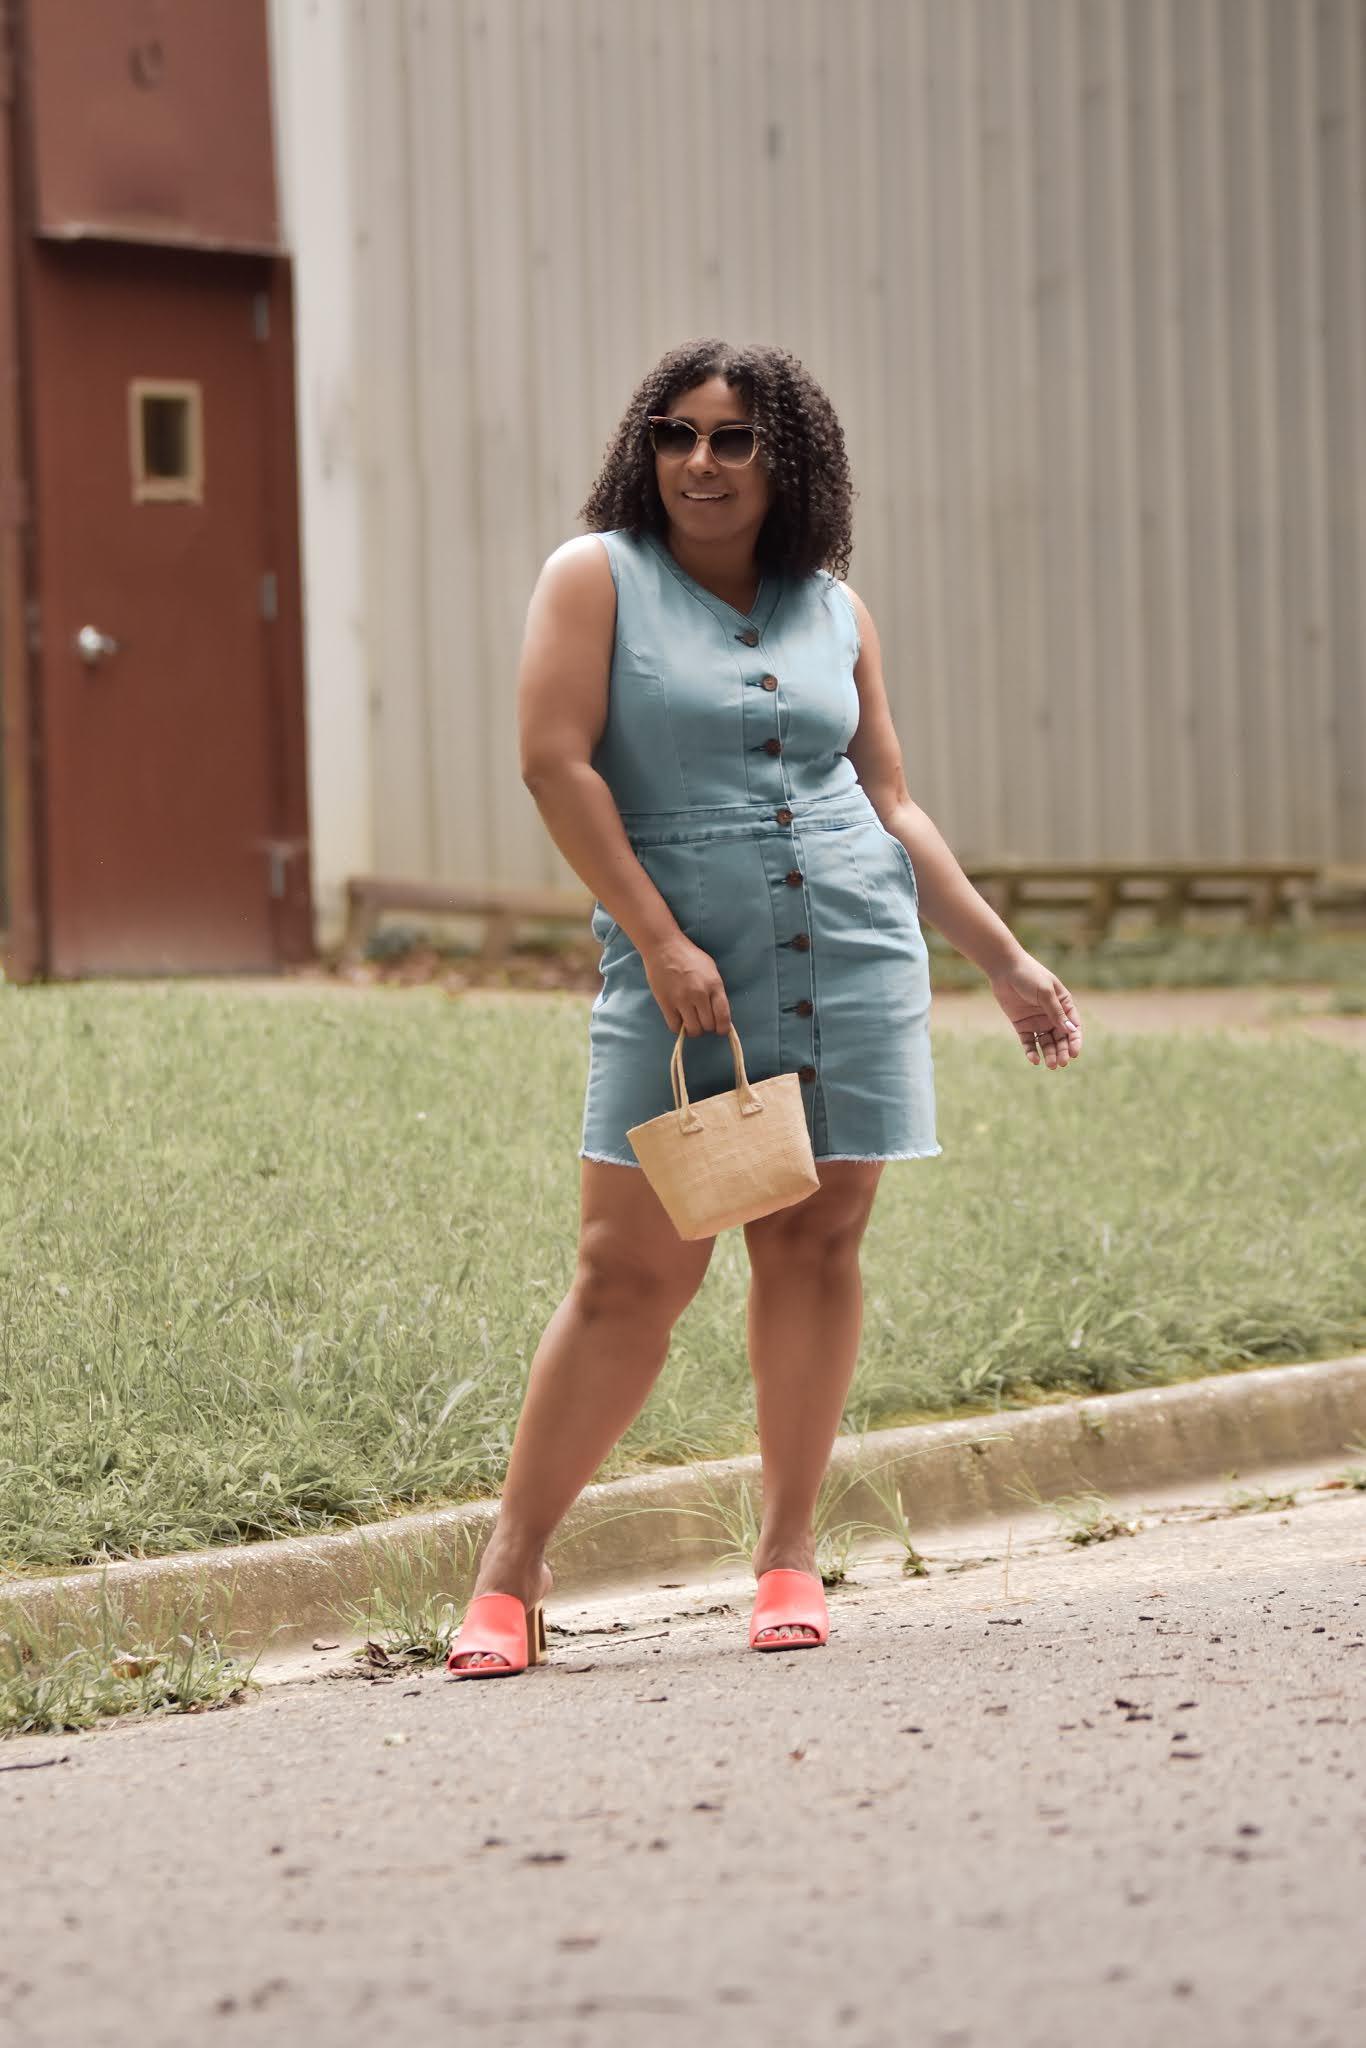 lookbook store, lookbook tsore reviews, denim dress, denim dress outfit ideas, how to style denim, denim trend 2020, pattys kloset, fashionable mom outfits